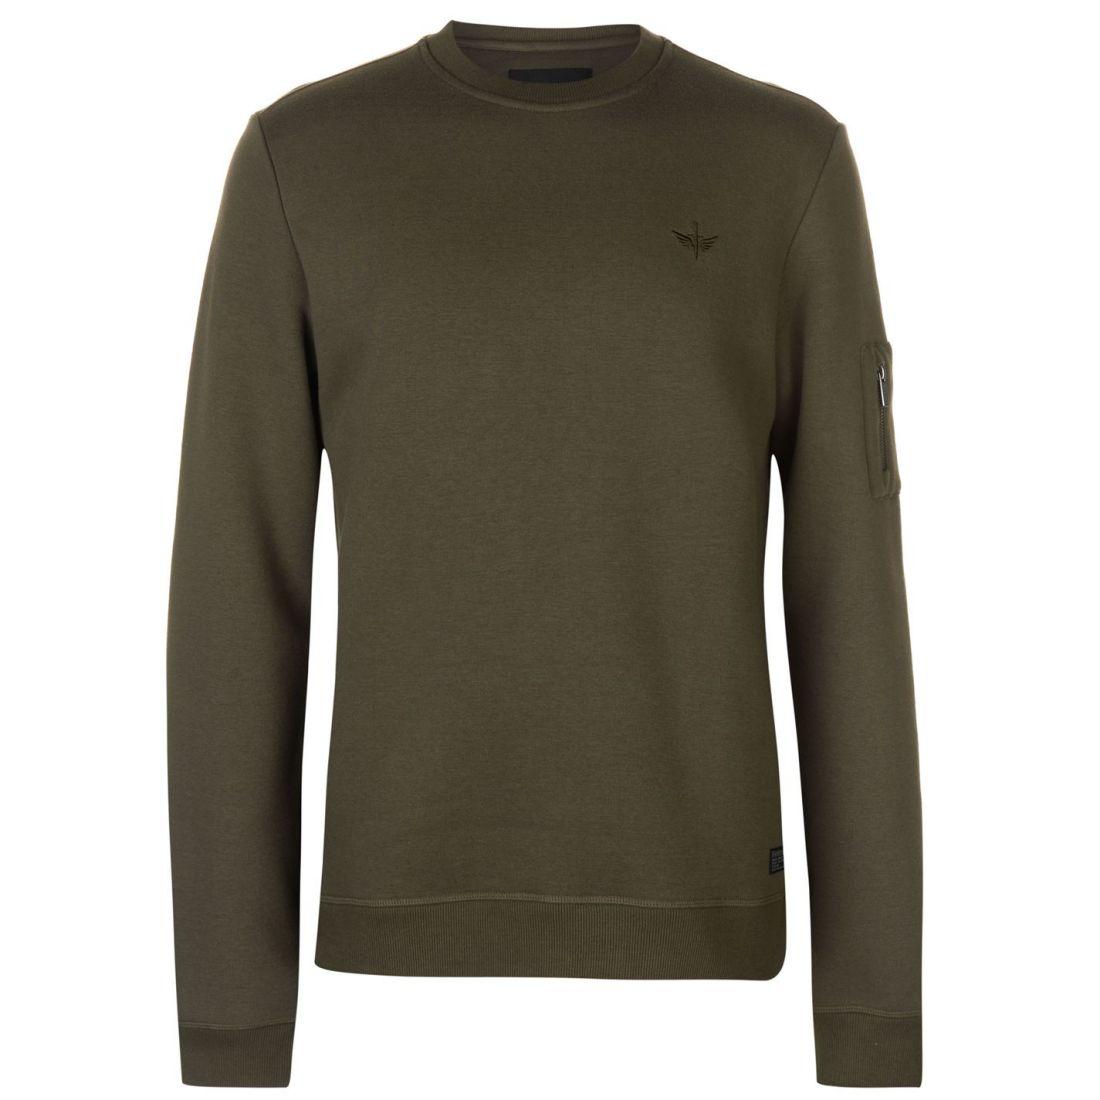 Firetrap Crew Neck Sweatshirt Mens Gents Pullover T Shirt Tee Top Jumper Full